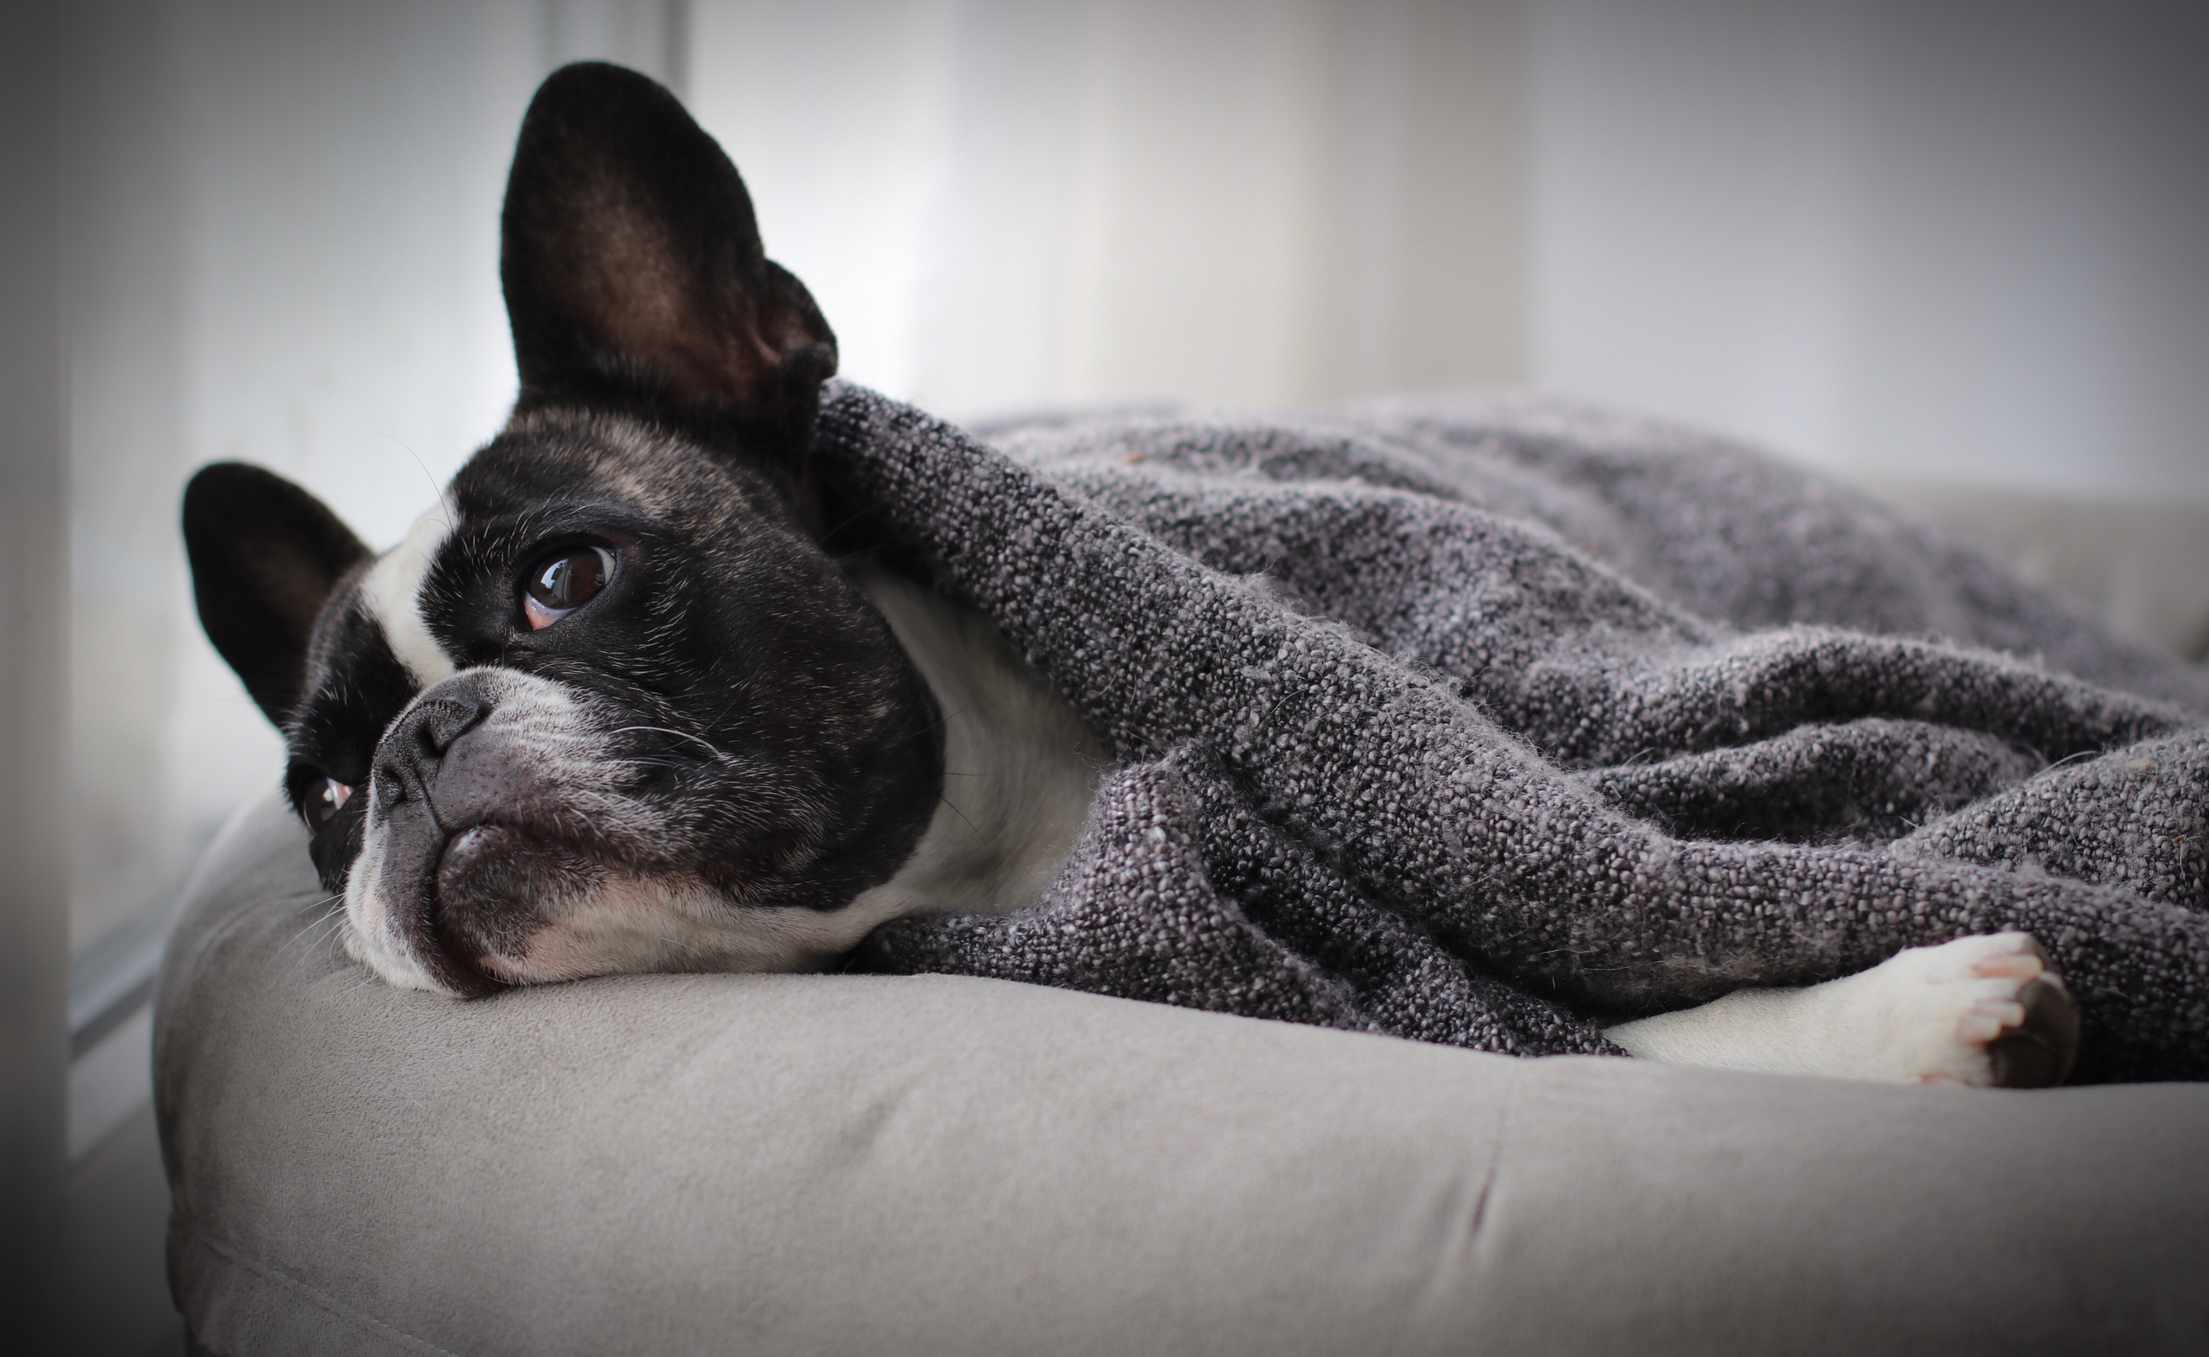 Puppy under bedspread